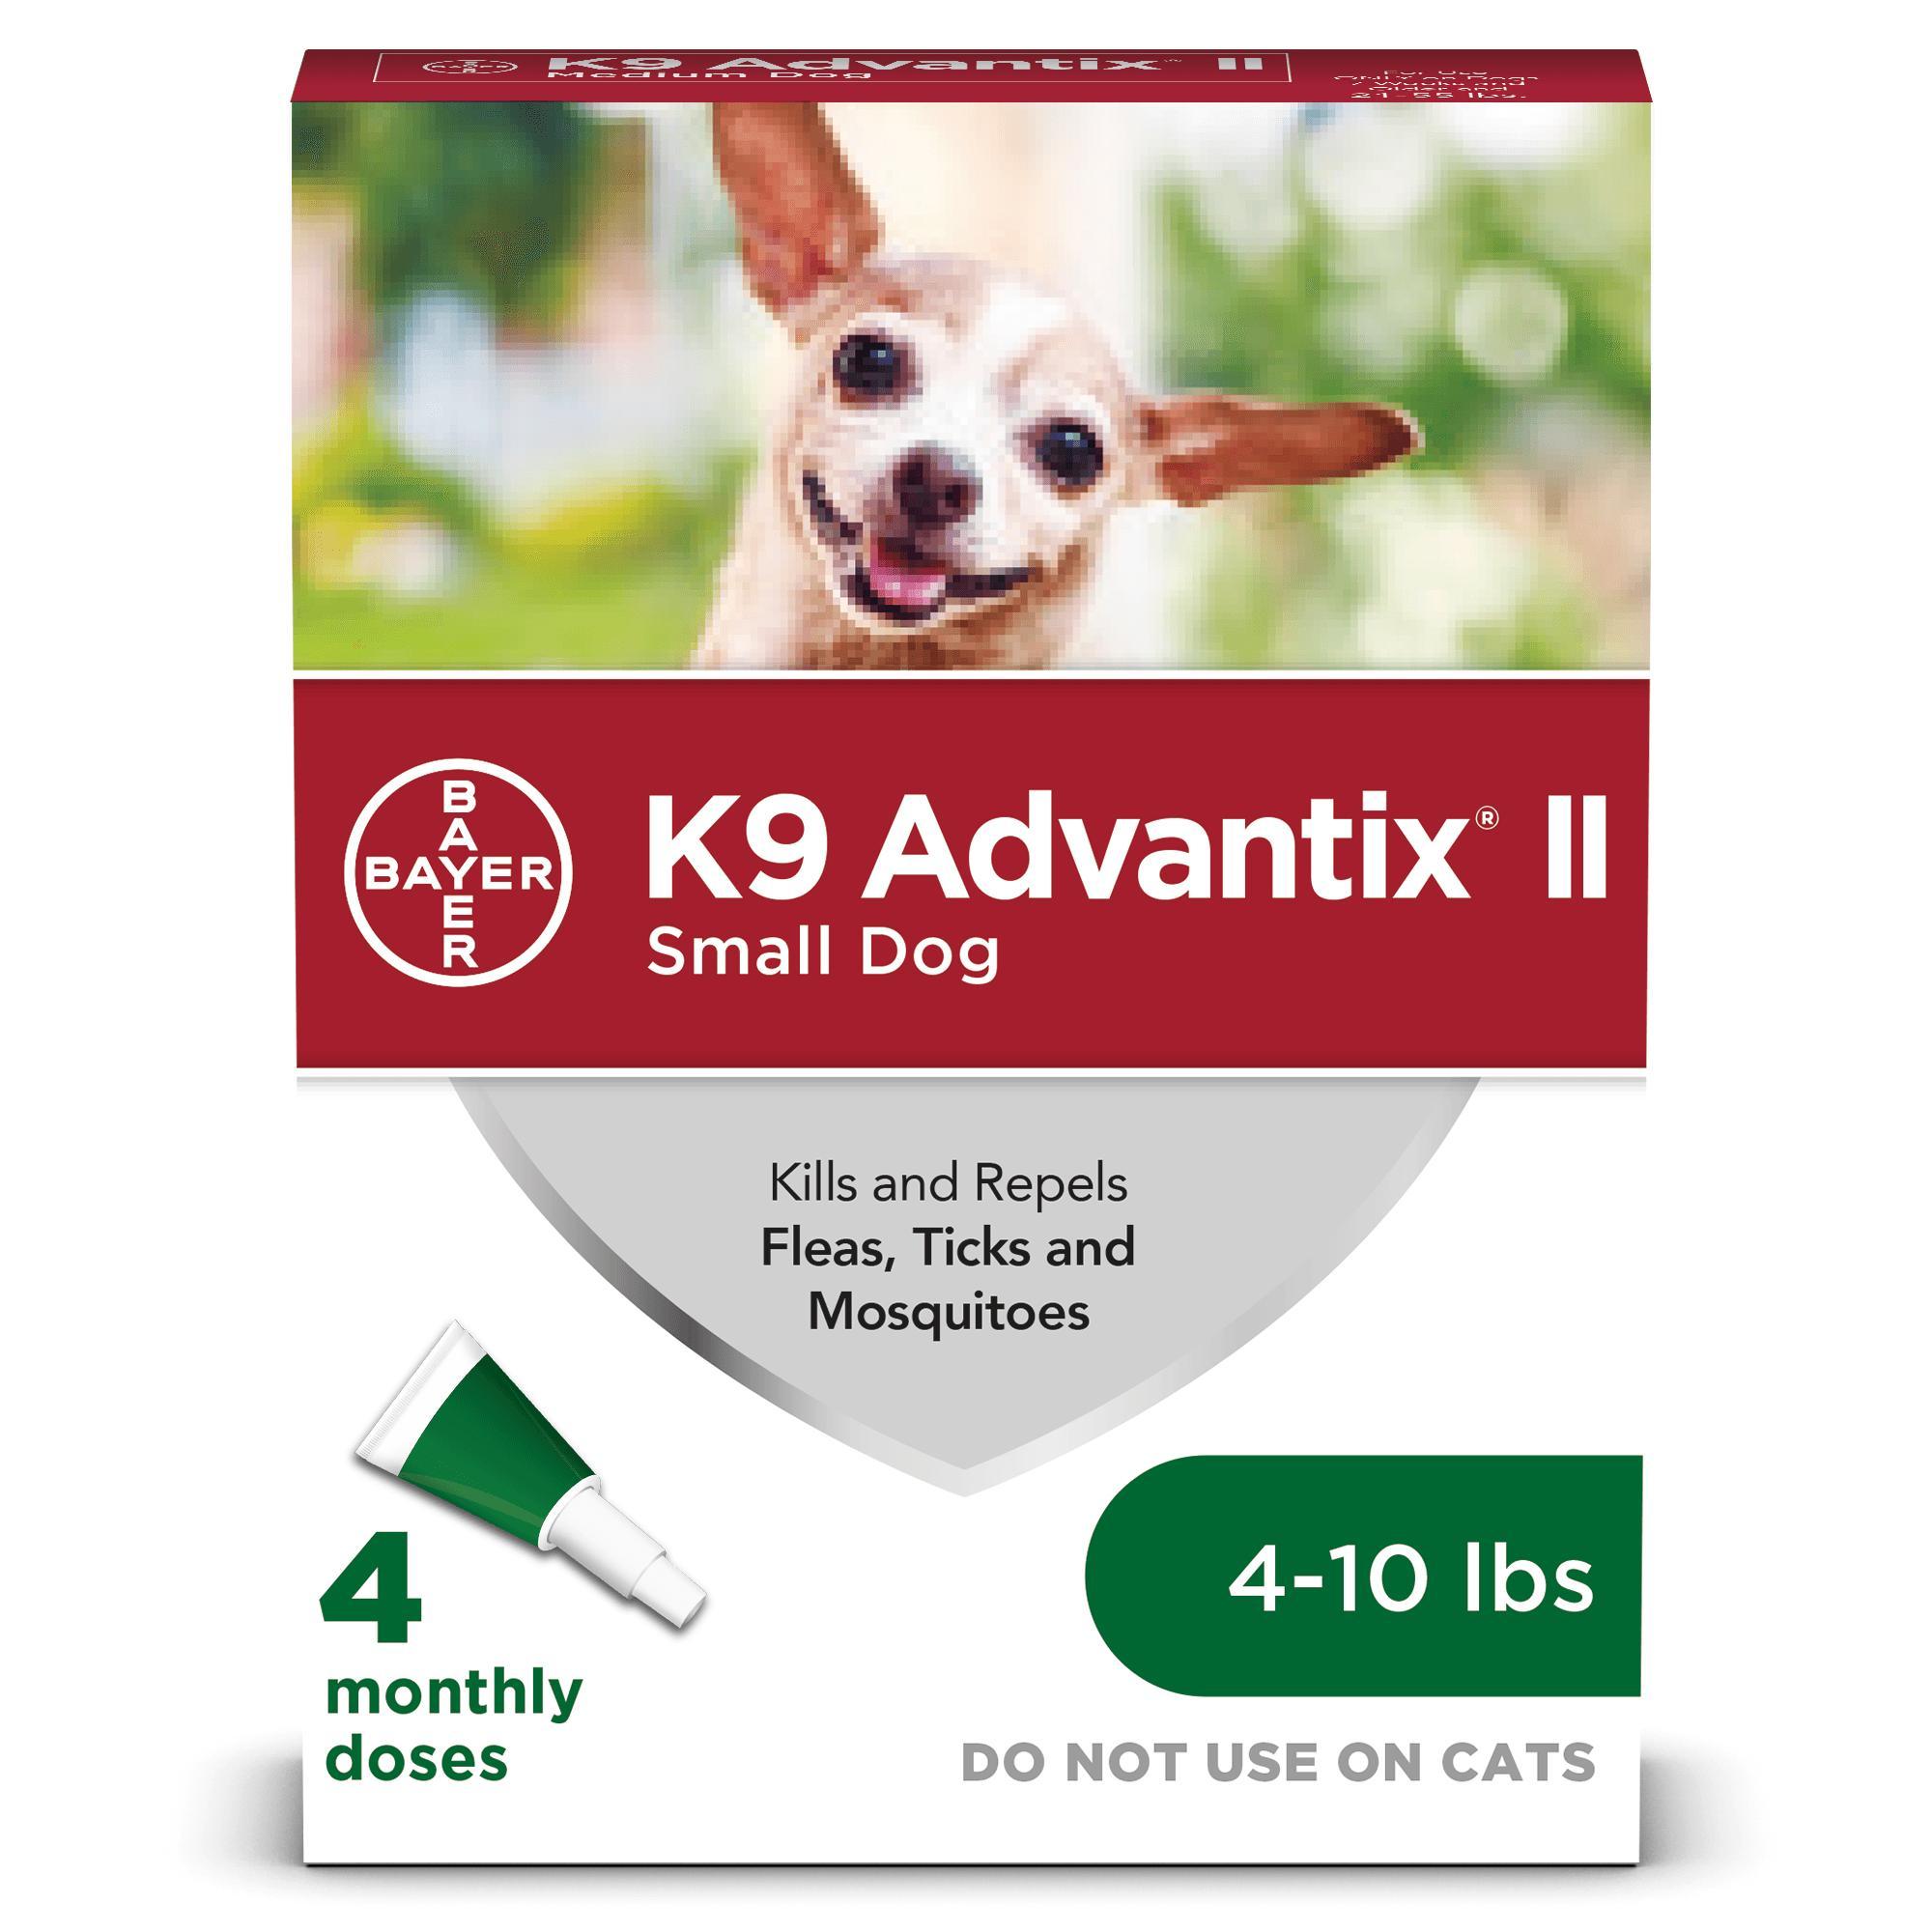 K9 Advantix II Flea & Tick Treatment for Small Dogs up to 4-10 lbs, 4-pack